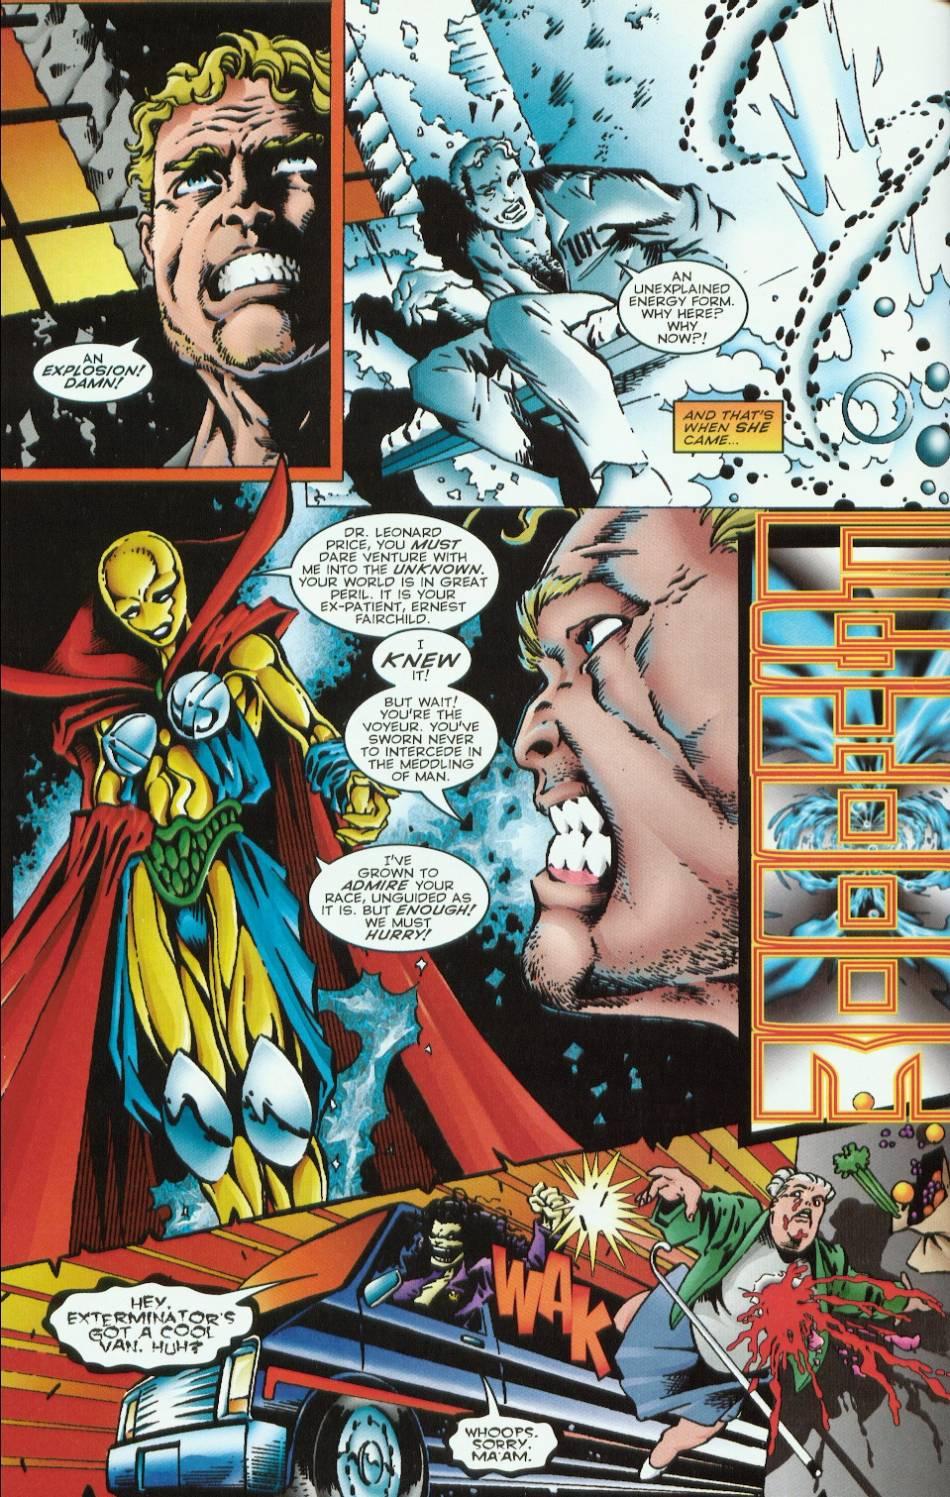 Read online Evil Ernie vs. the Superheroes comic -  Issue #1 - 14